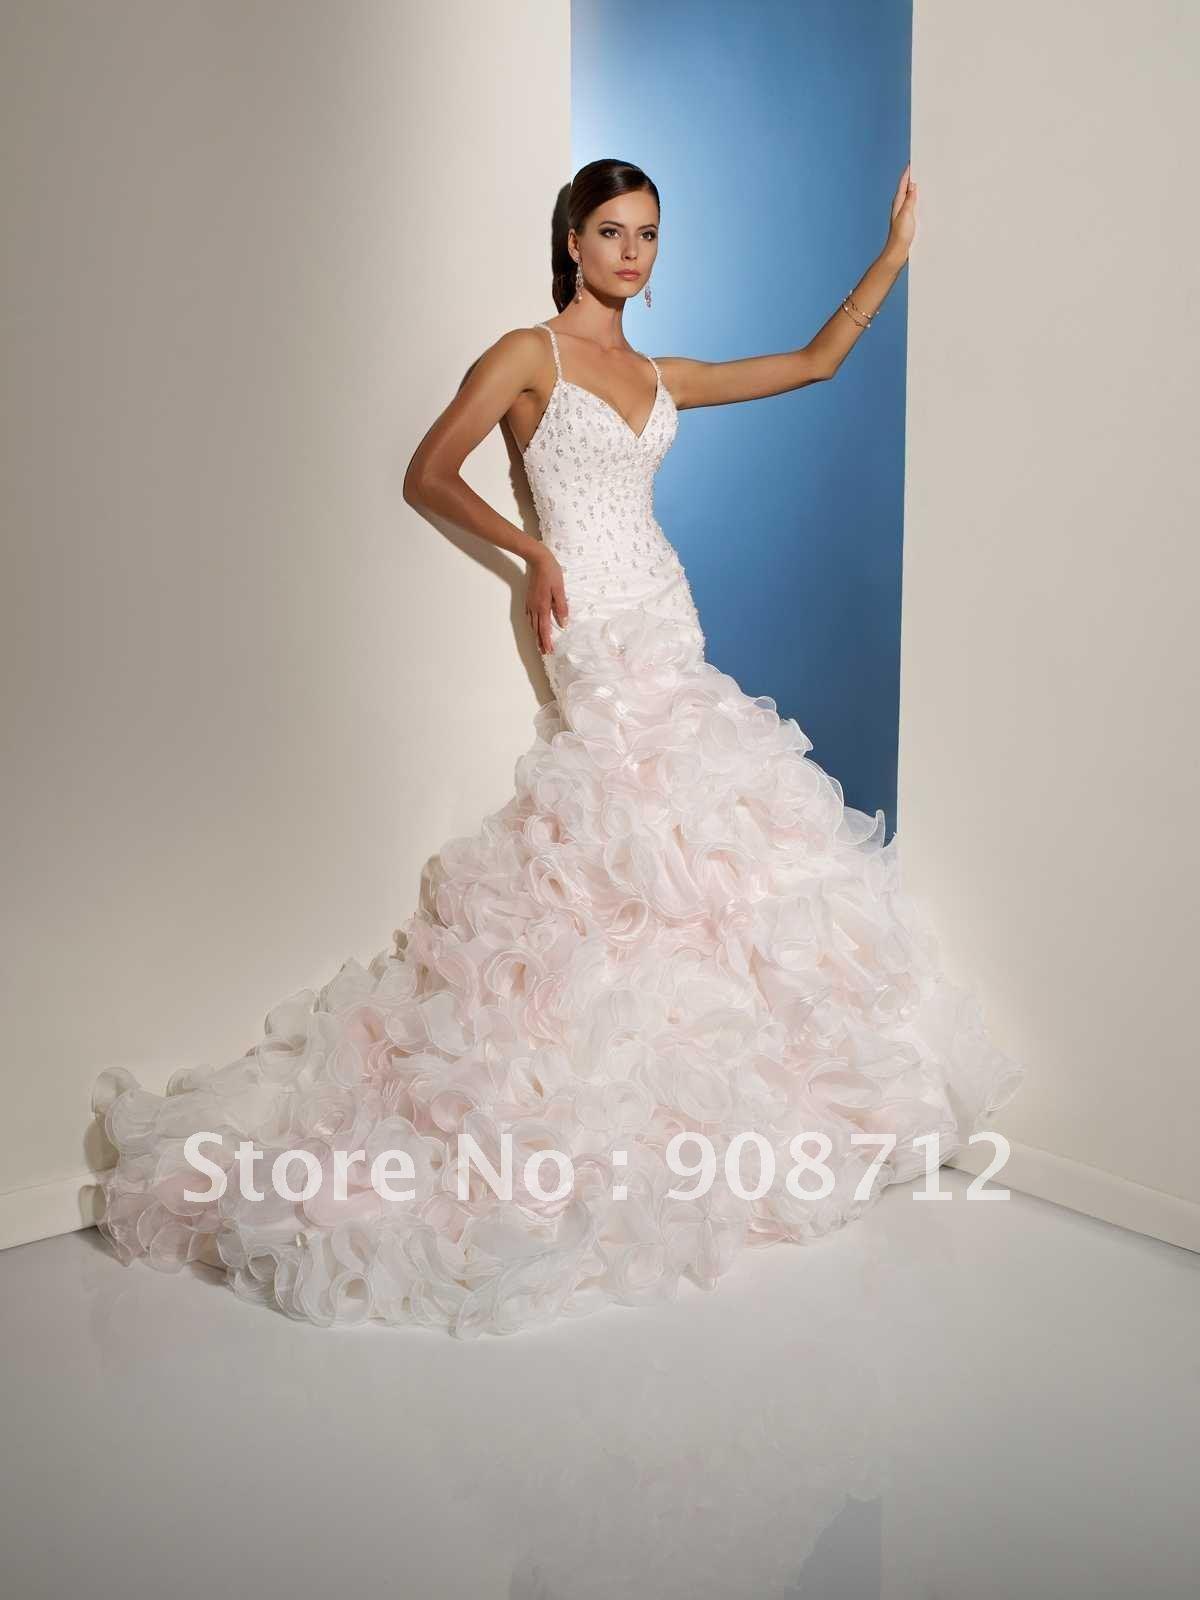 Designer Feather Dresses